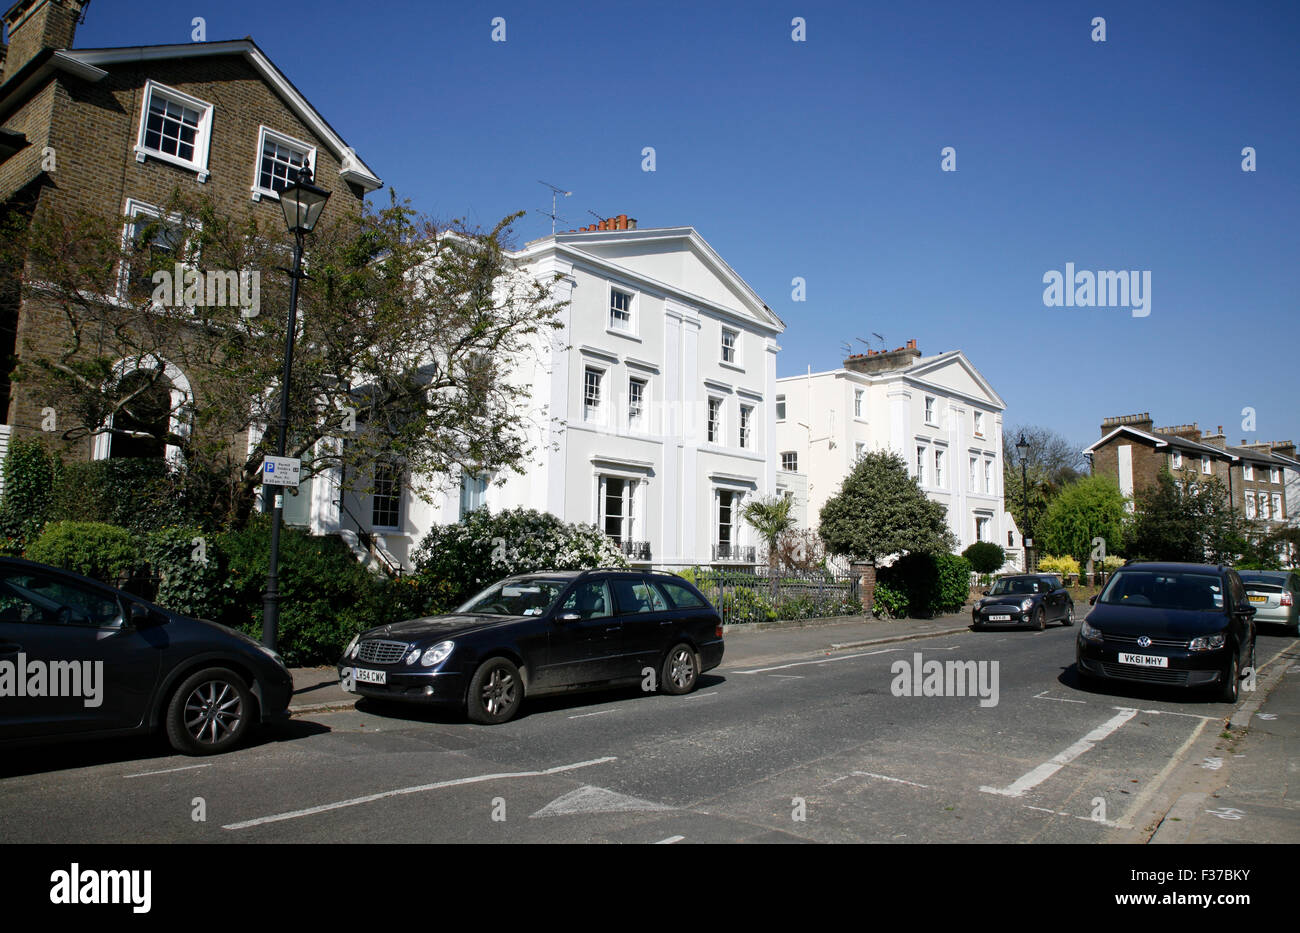 Stockwell Park Crescent, Stockwell, London, UK - Stock Image